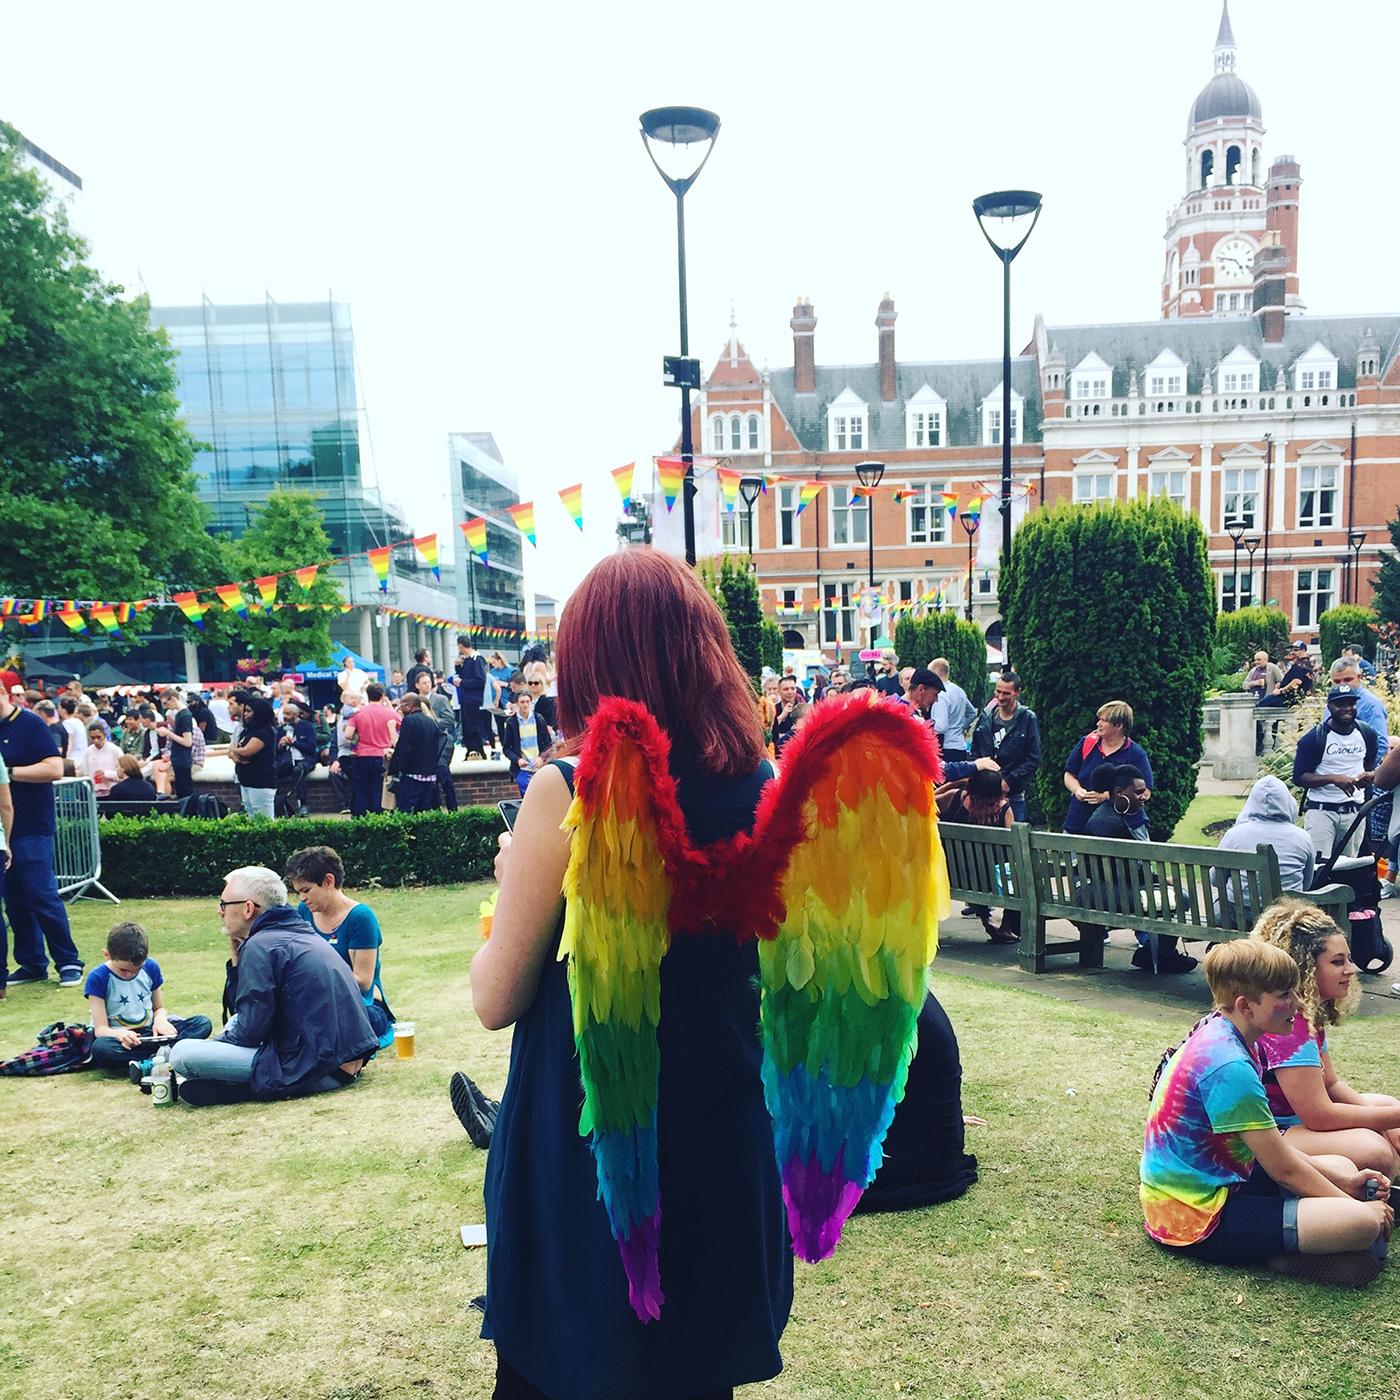 croydonist-pridefest-0694-1400px